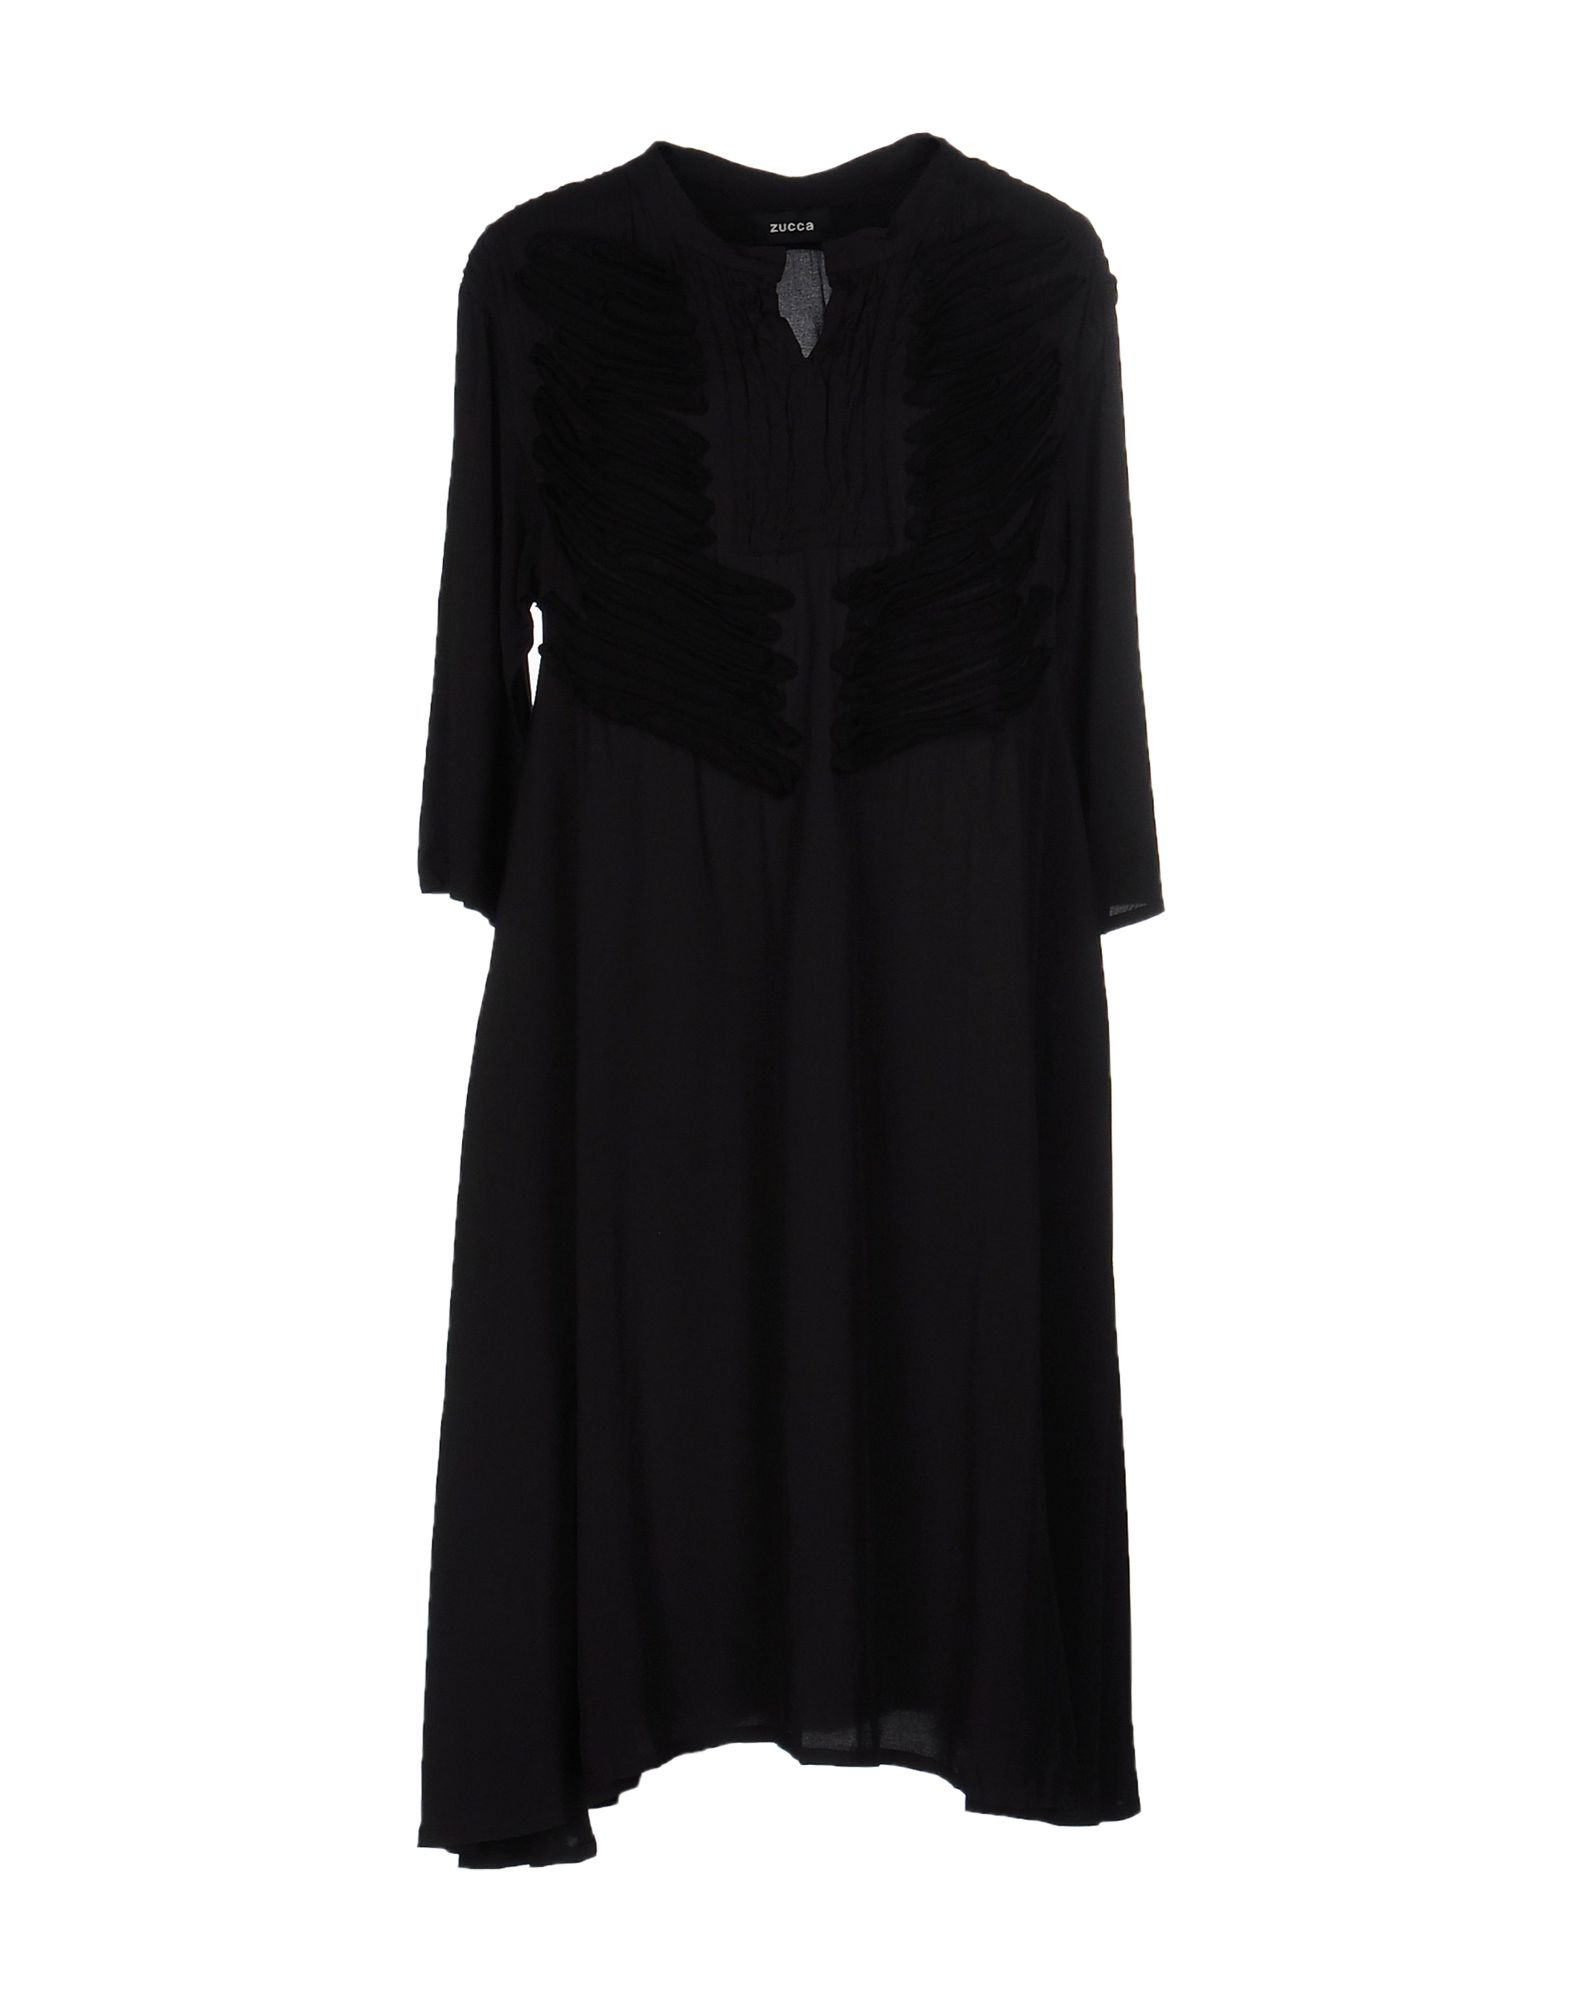 ZUCCA Knee-Length Dress in Black